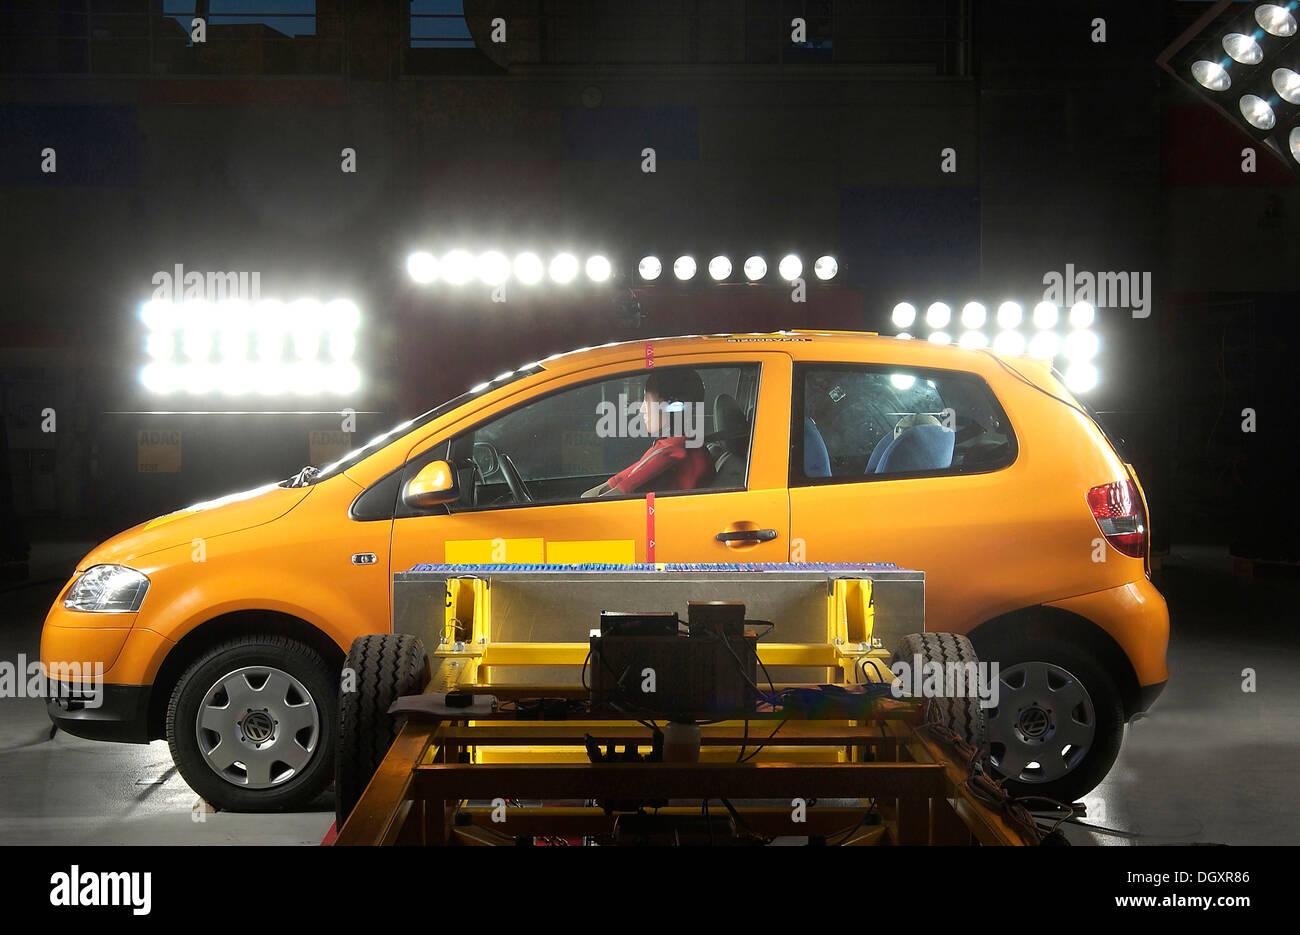 Crash Test Dummies In A Car Behind A Battering Ram Stock Photo